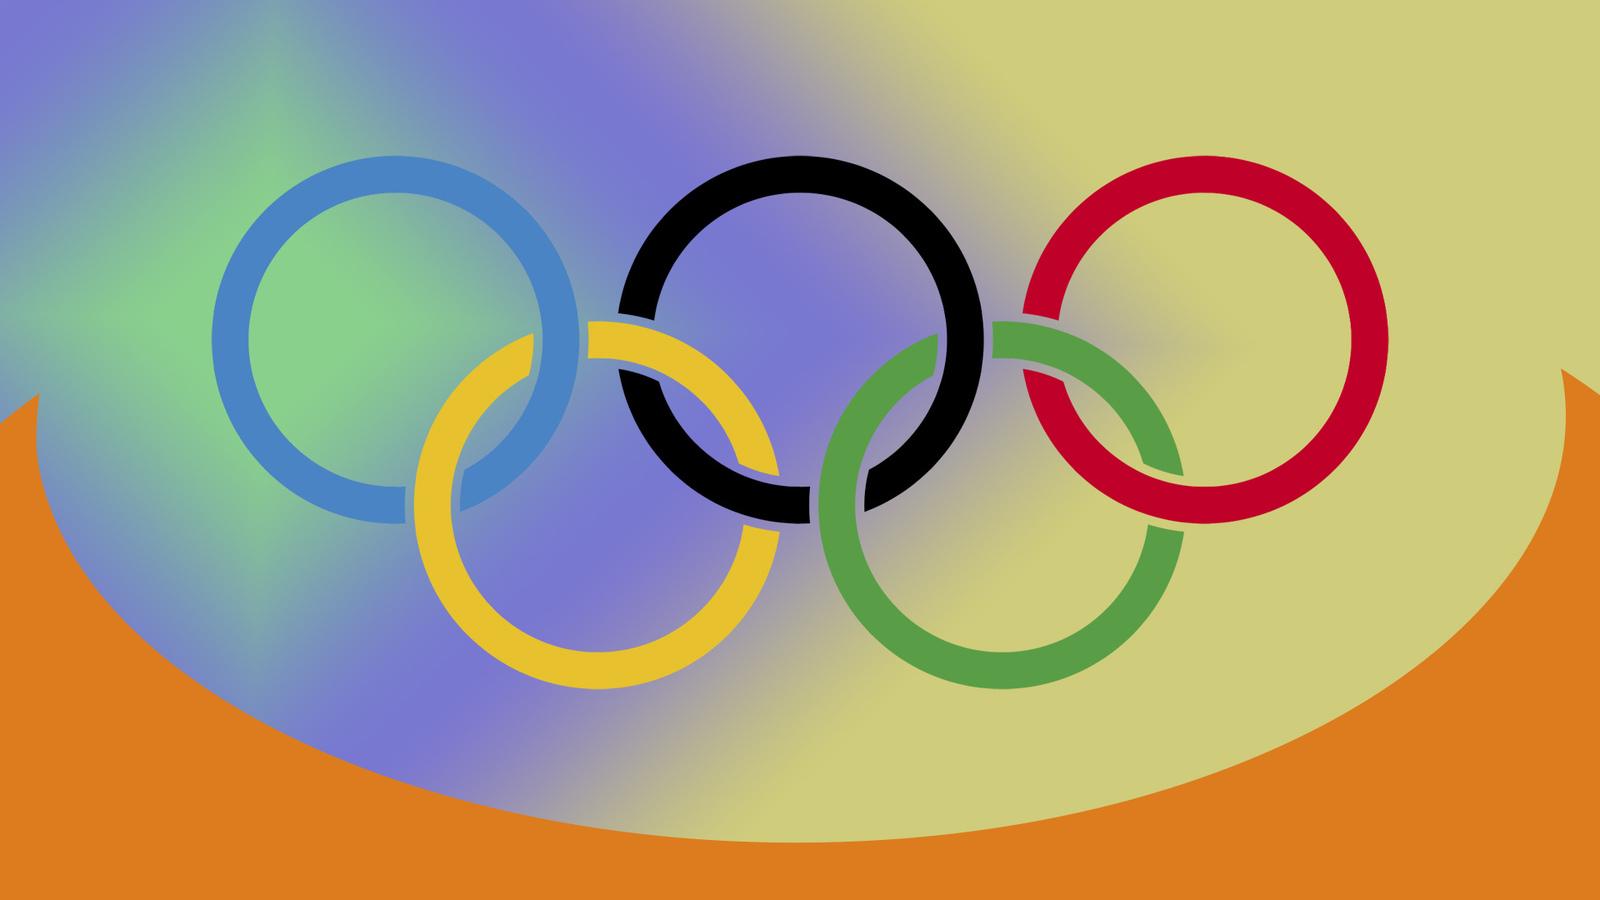 rio, рио, олимпиада, бразилия, 2016